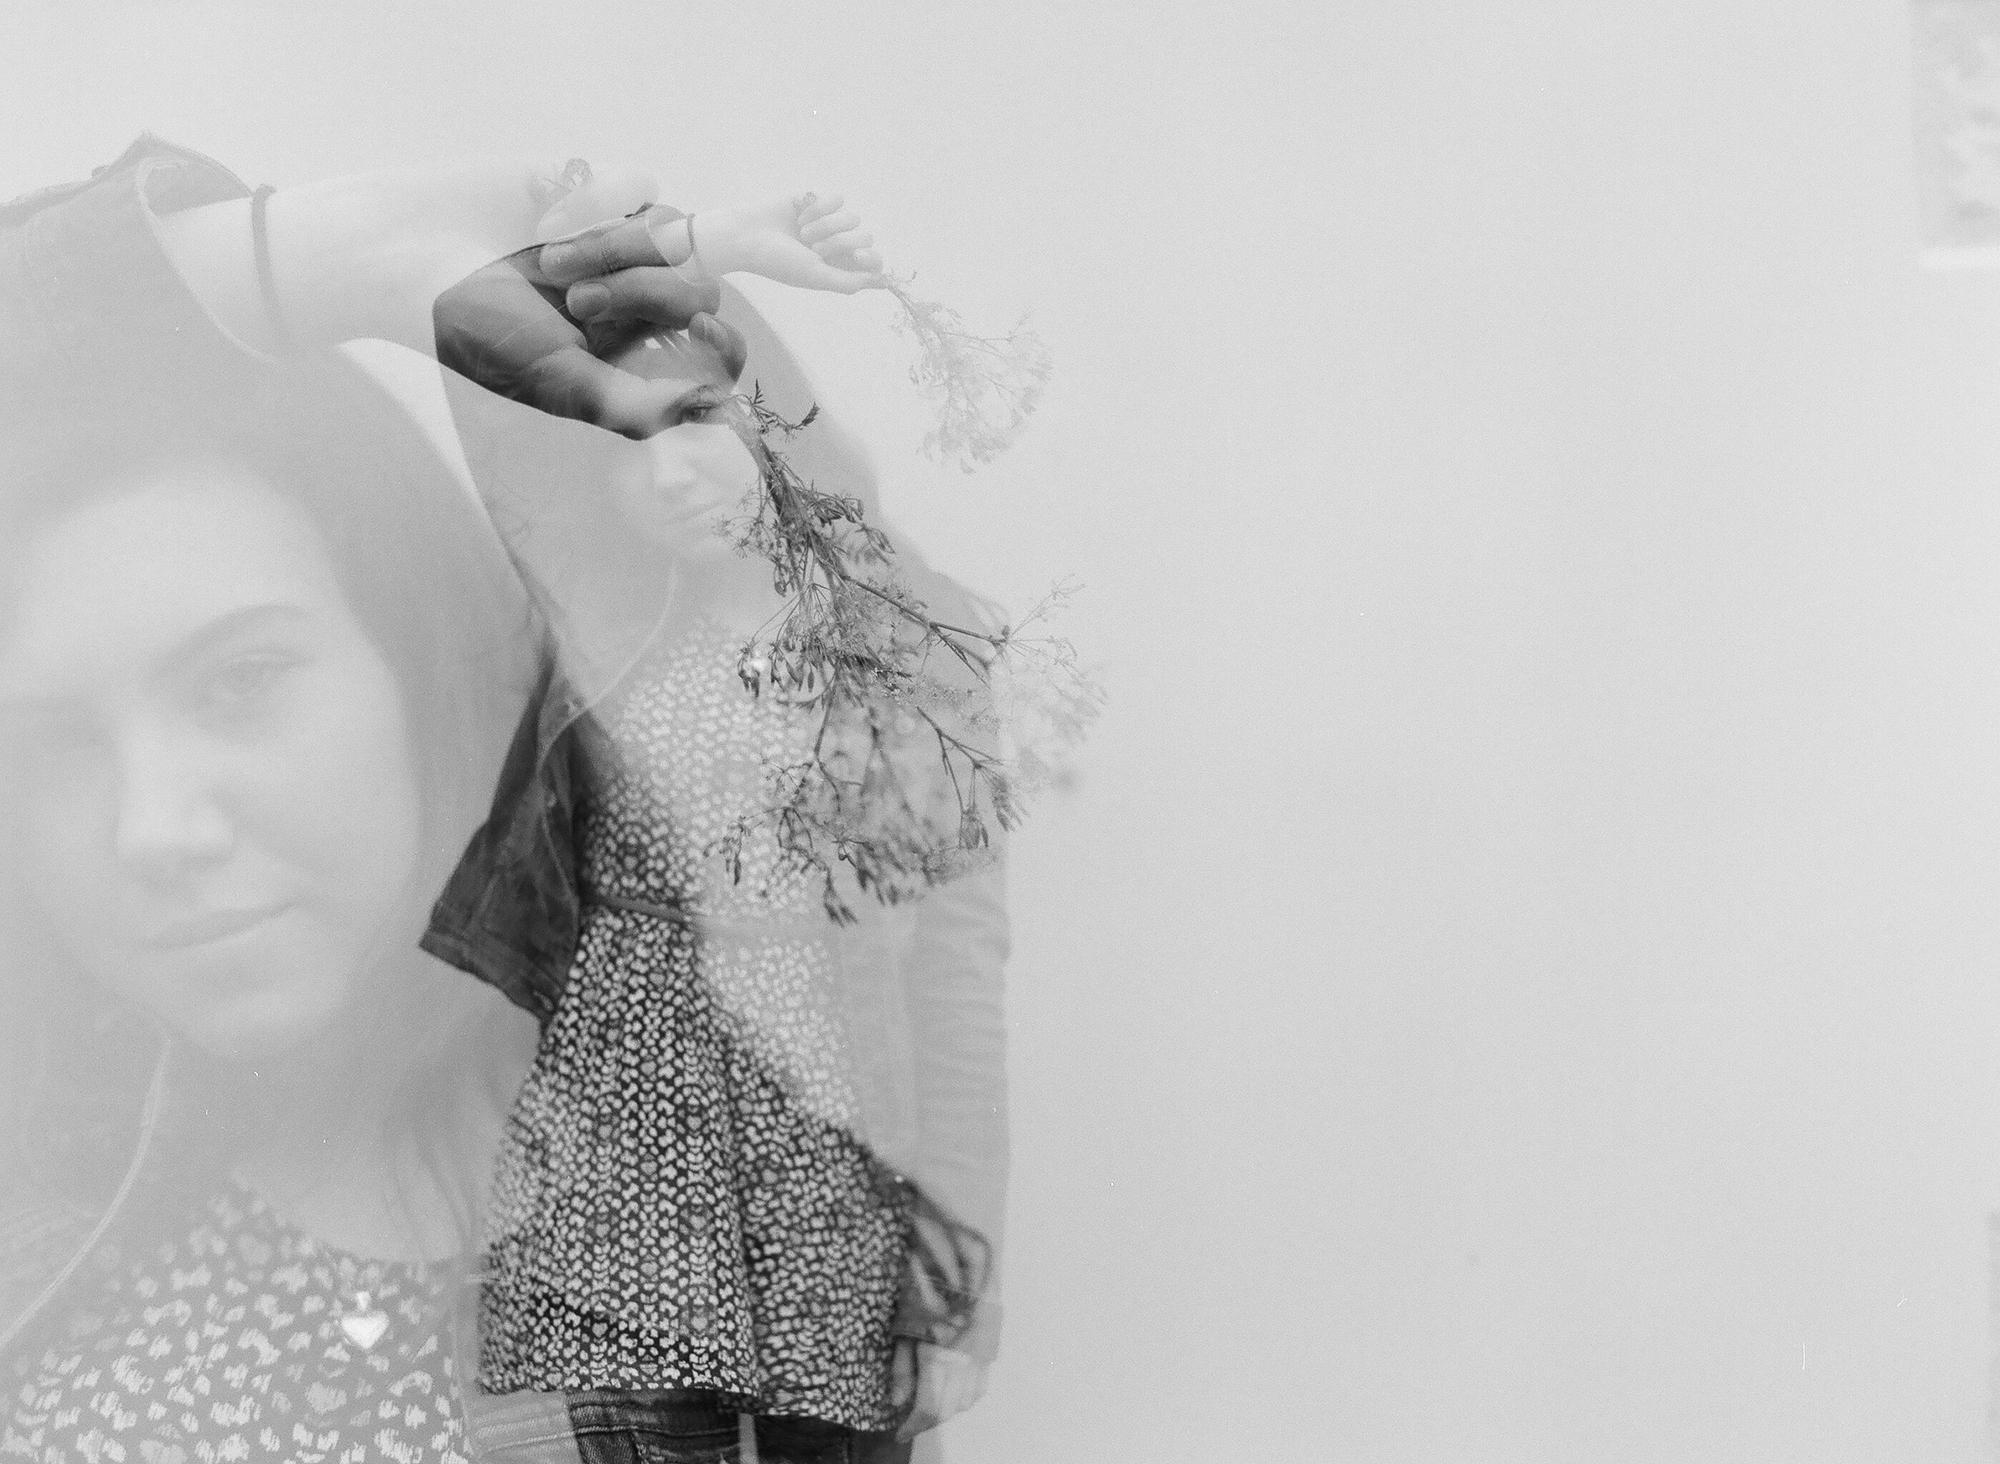 cumbria-family-photographer (1).jpg